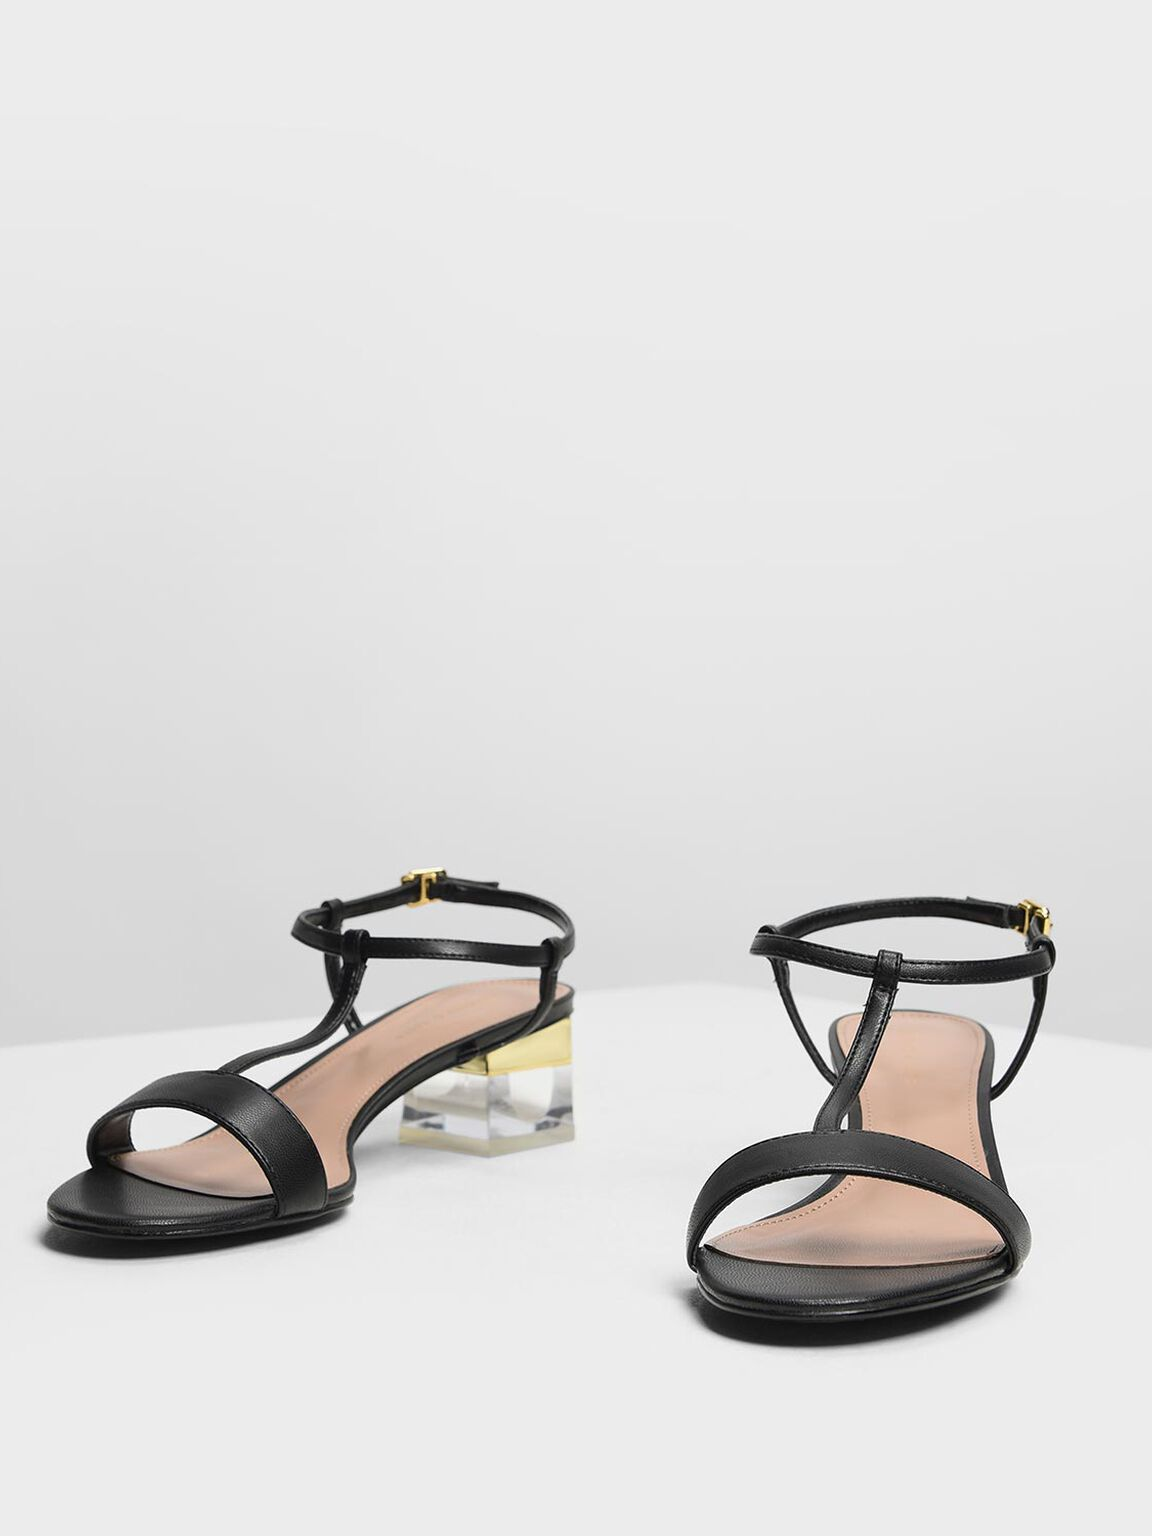 T-Bar Lucite Heel Sandals, Black, hi-res